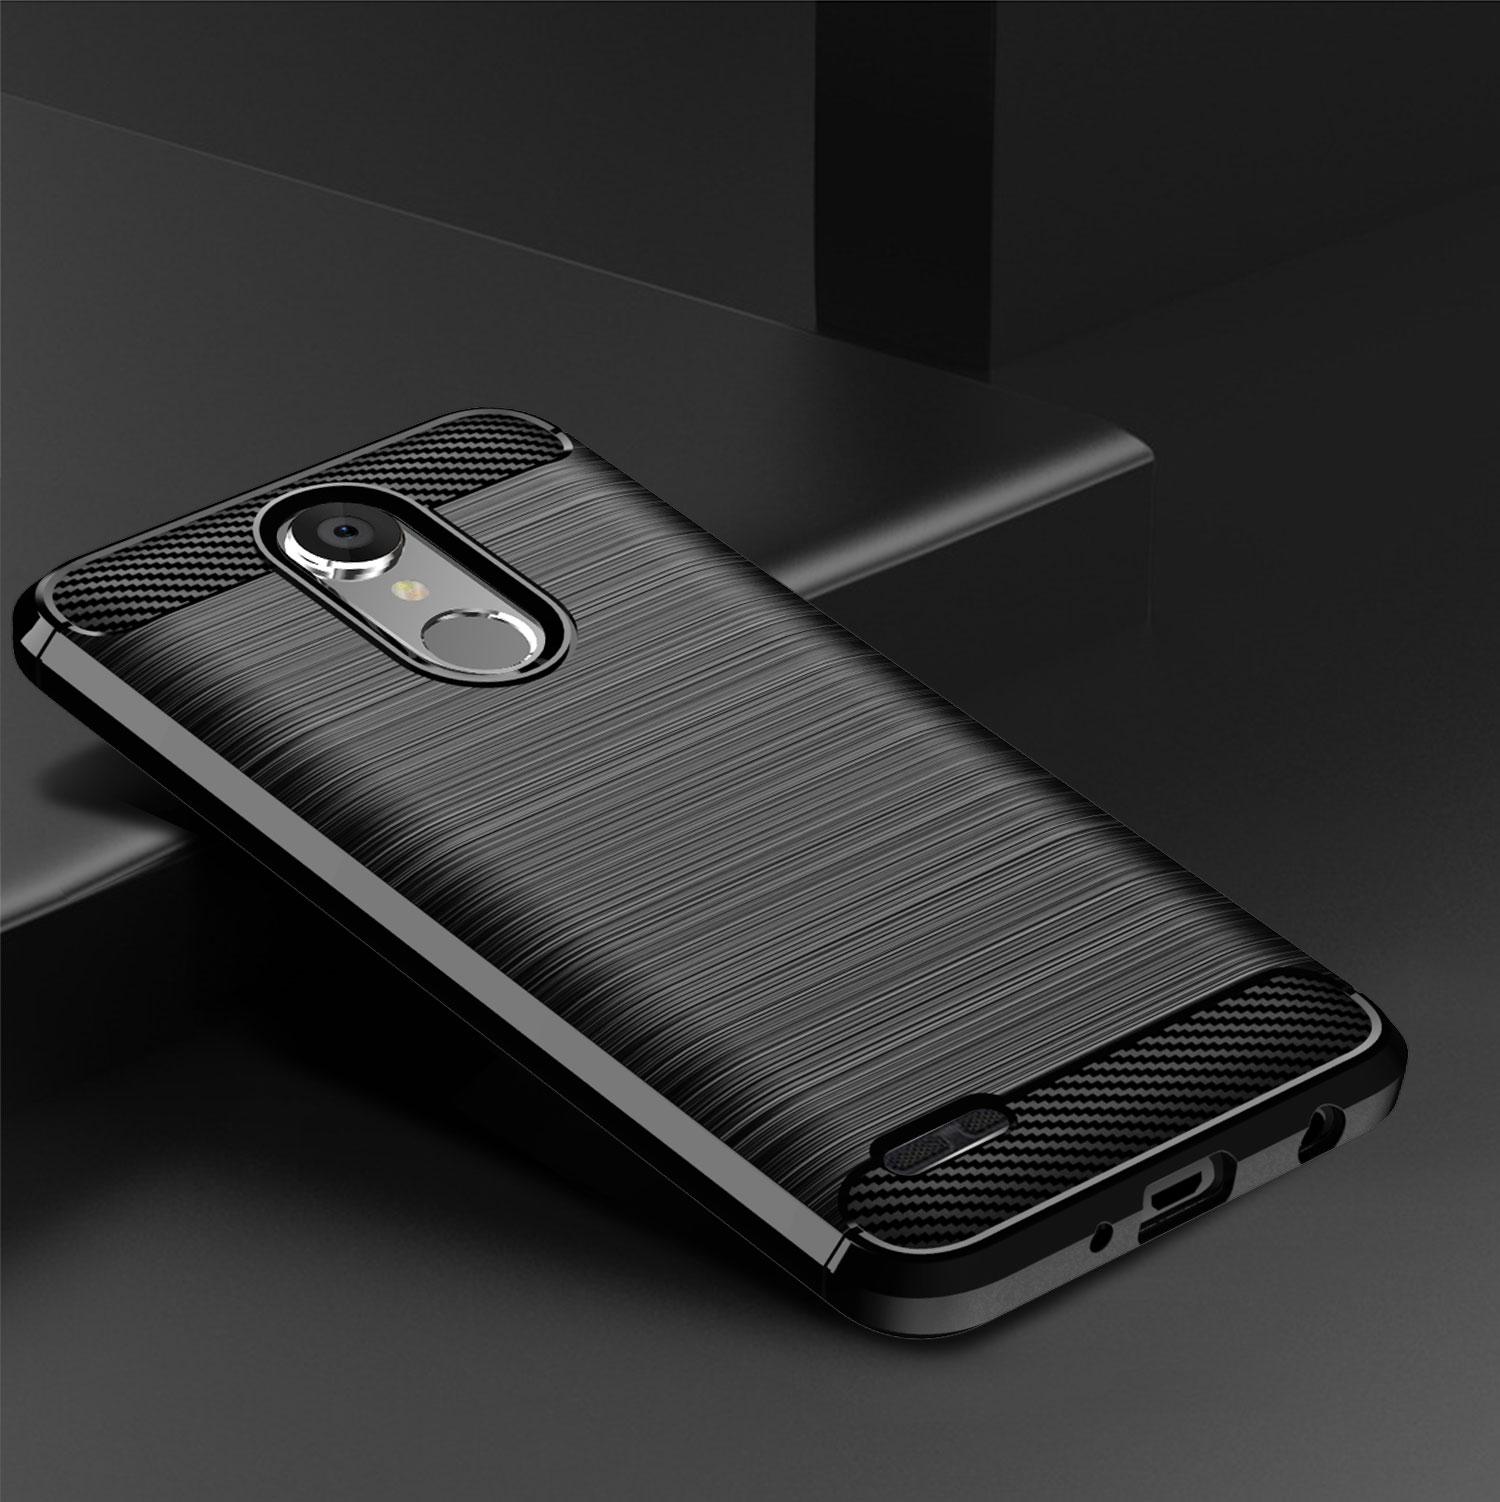 Caso para LG Stylo 6 5 4 G7 ThinQ G8 G6 más K51S K41S K40 K50 K8S G8X G8S Q70 K61 Q61 K31 K50S V60 de fibra de carbono de la cubierta de la caja del teléfono